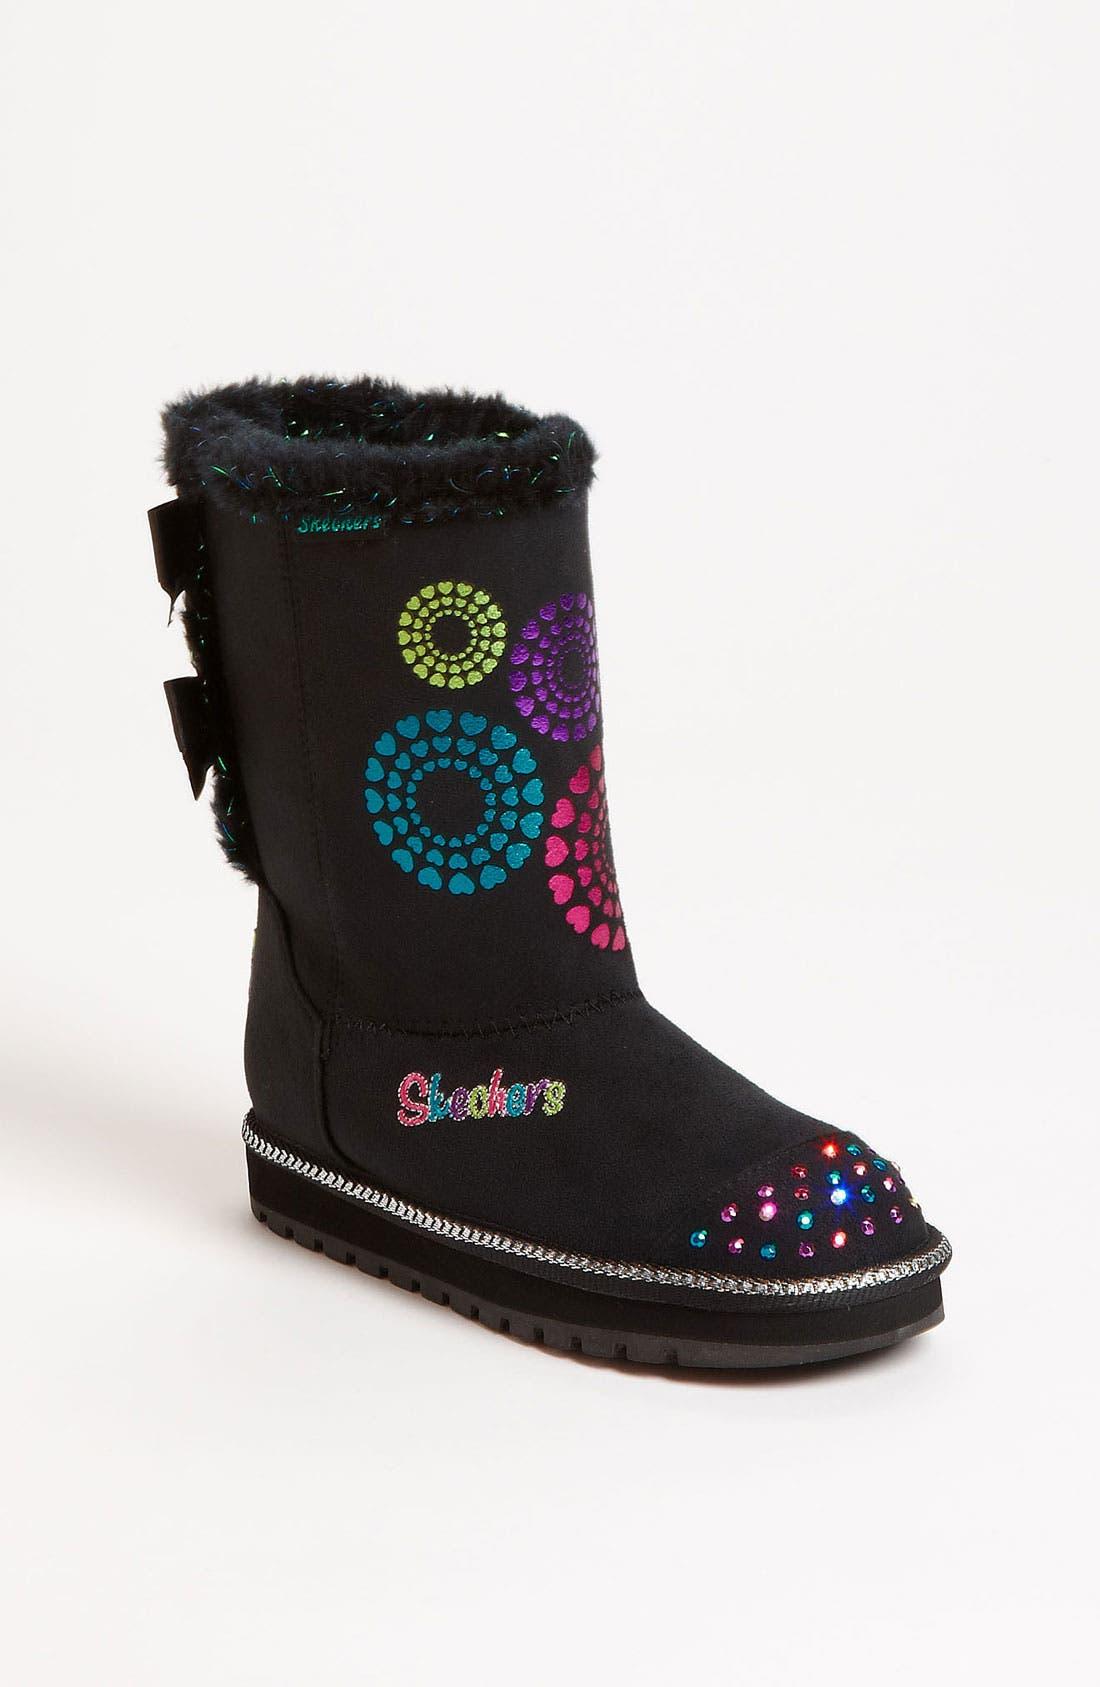 Main Image - SKECHERS 'Baby Bow' Light-Up Boot (Walker, Toddler, Little Kid & Big Kid)